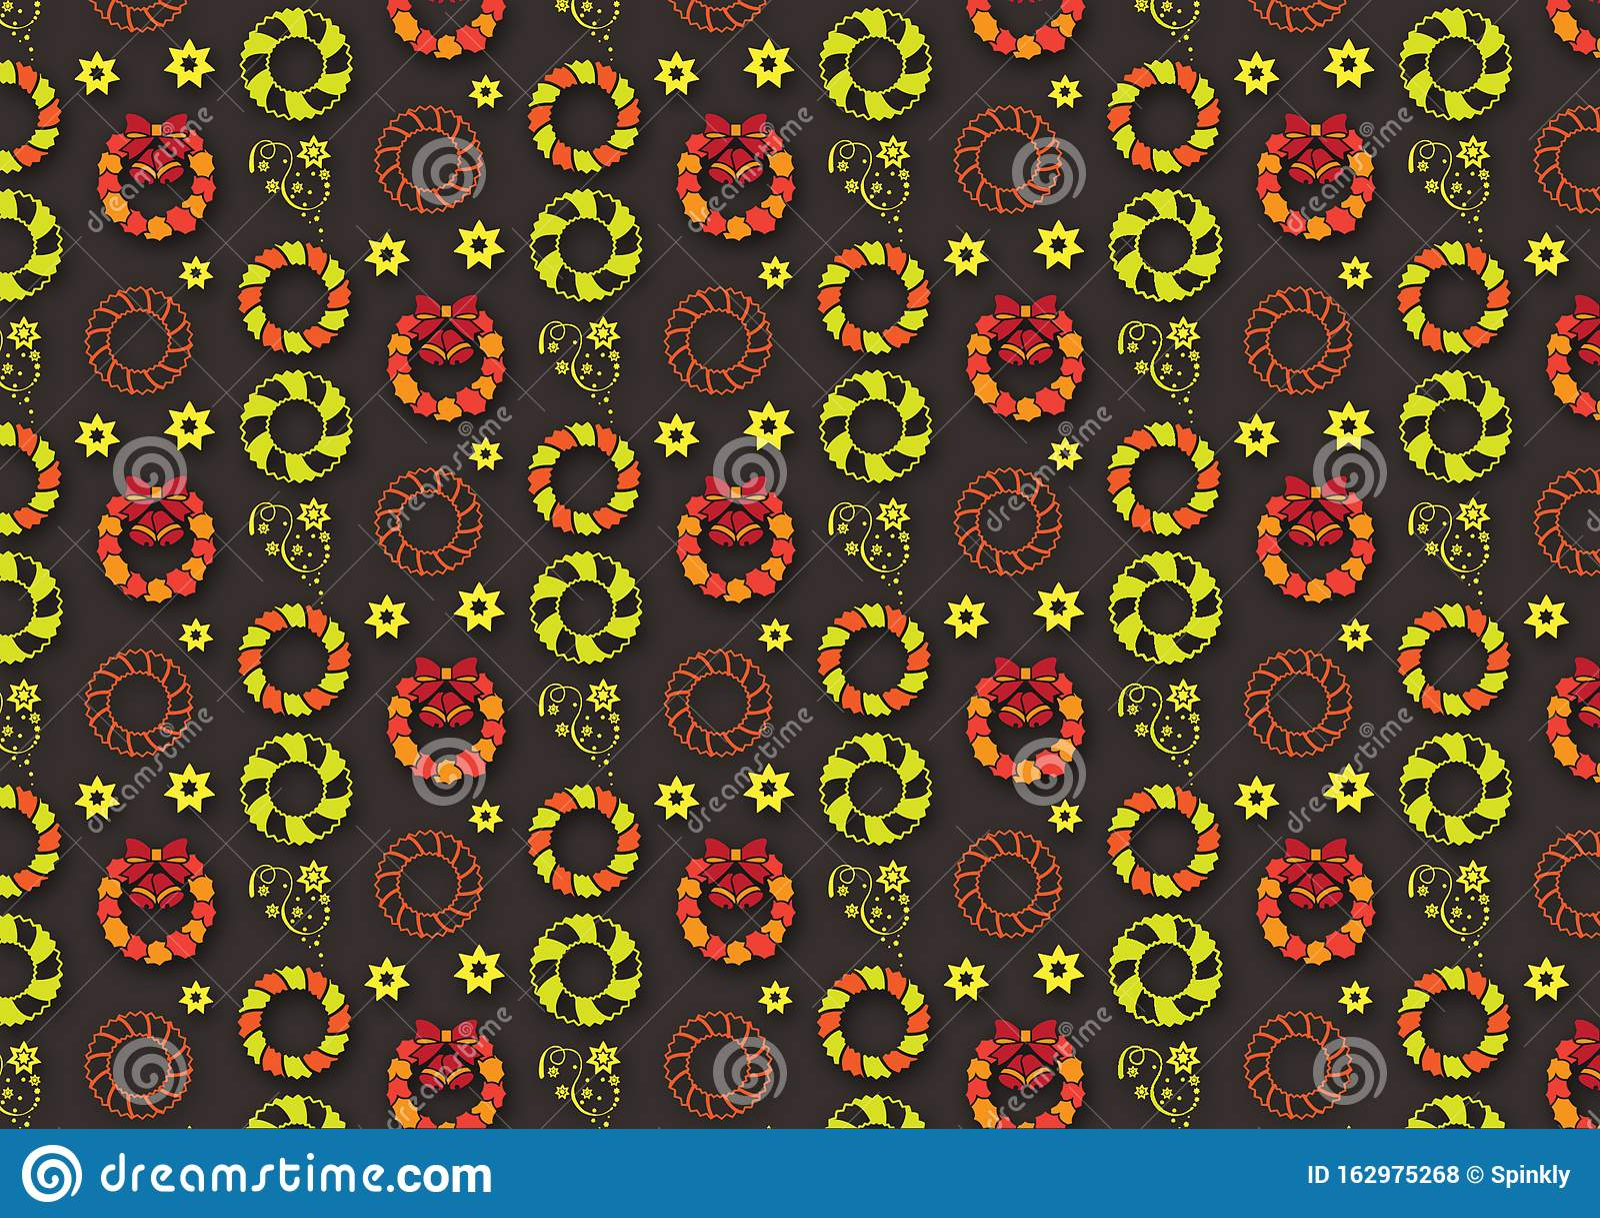 Christmas ornament pattern design background wallpaper